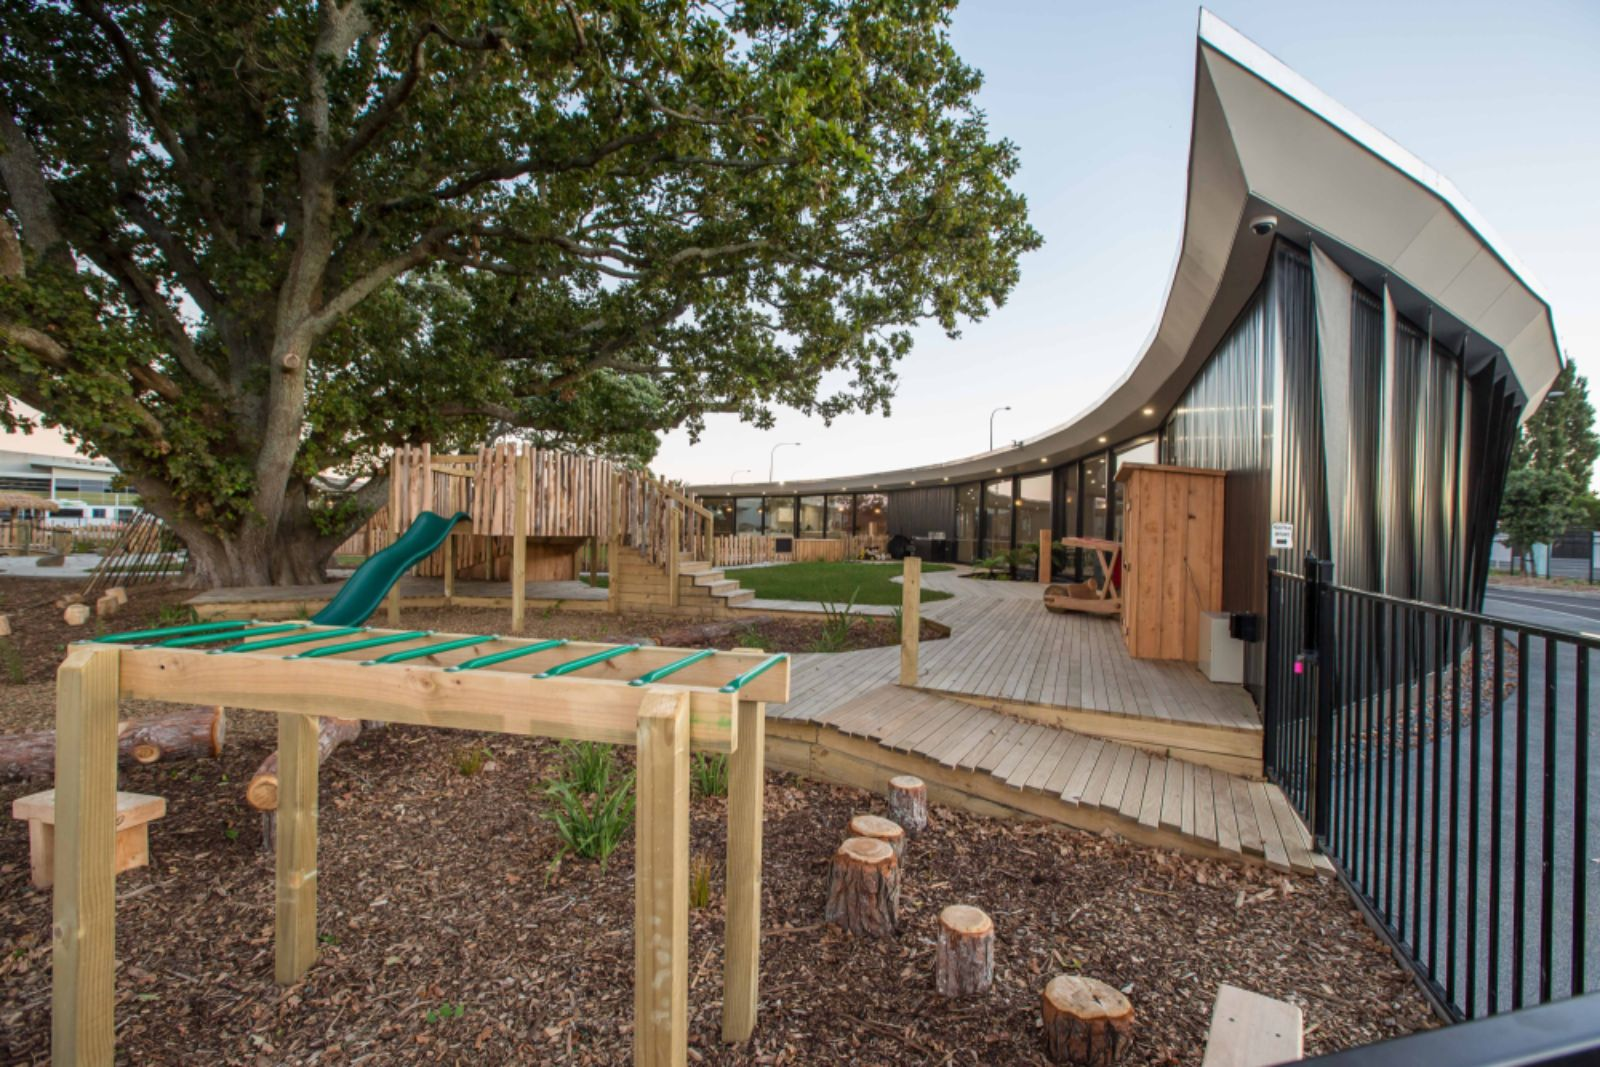 Chrysalis Childcare Centre